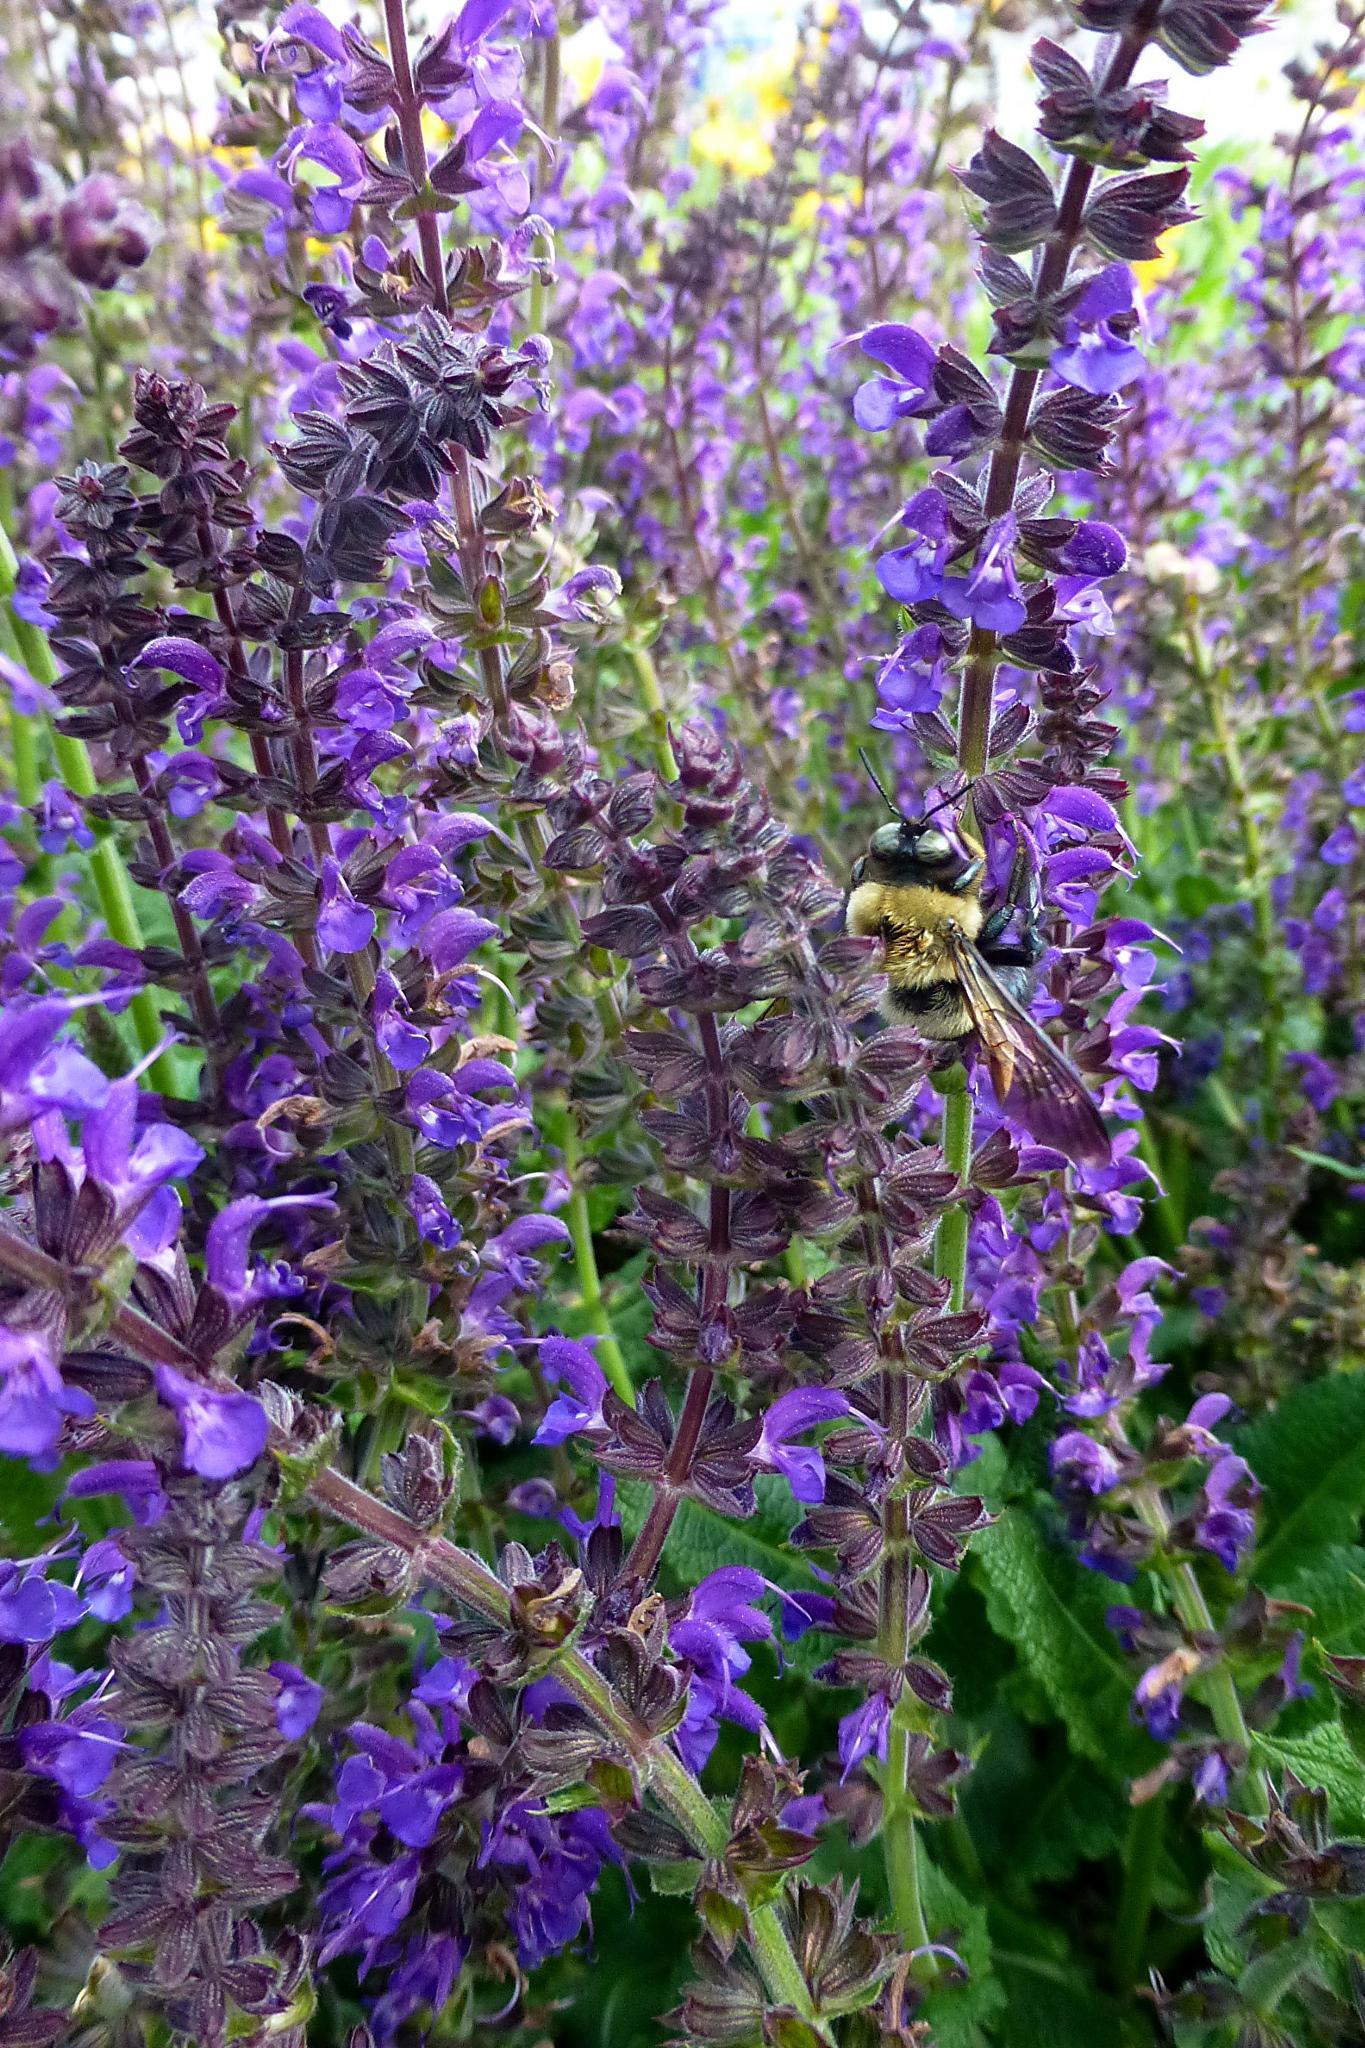 Busy Bee by Terri Scache Harris